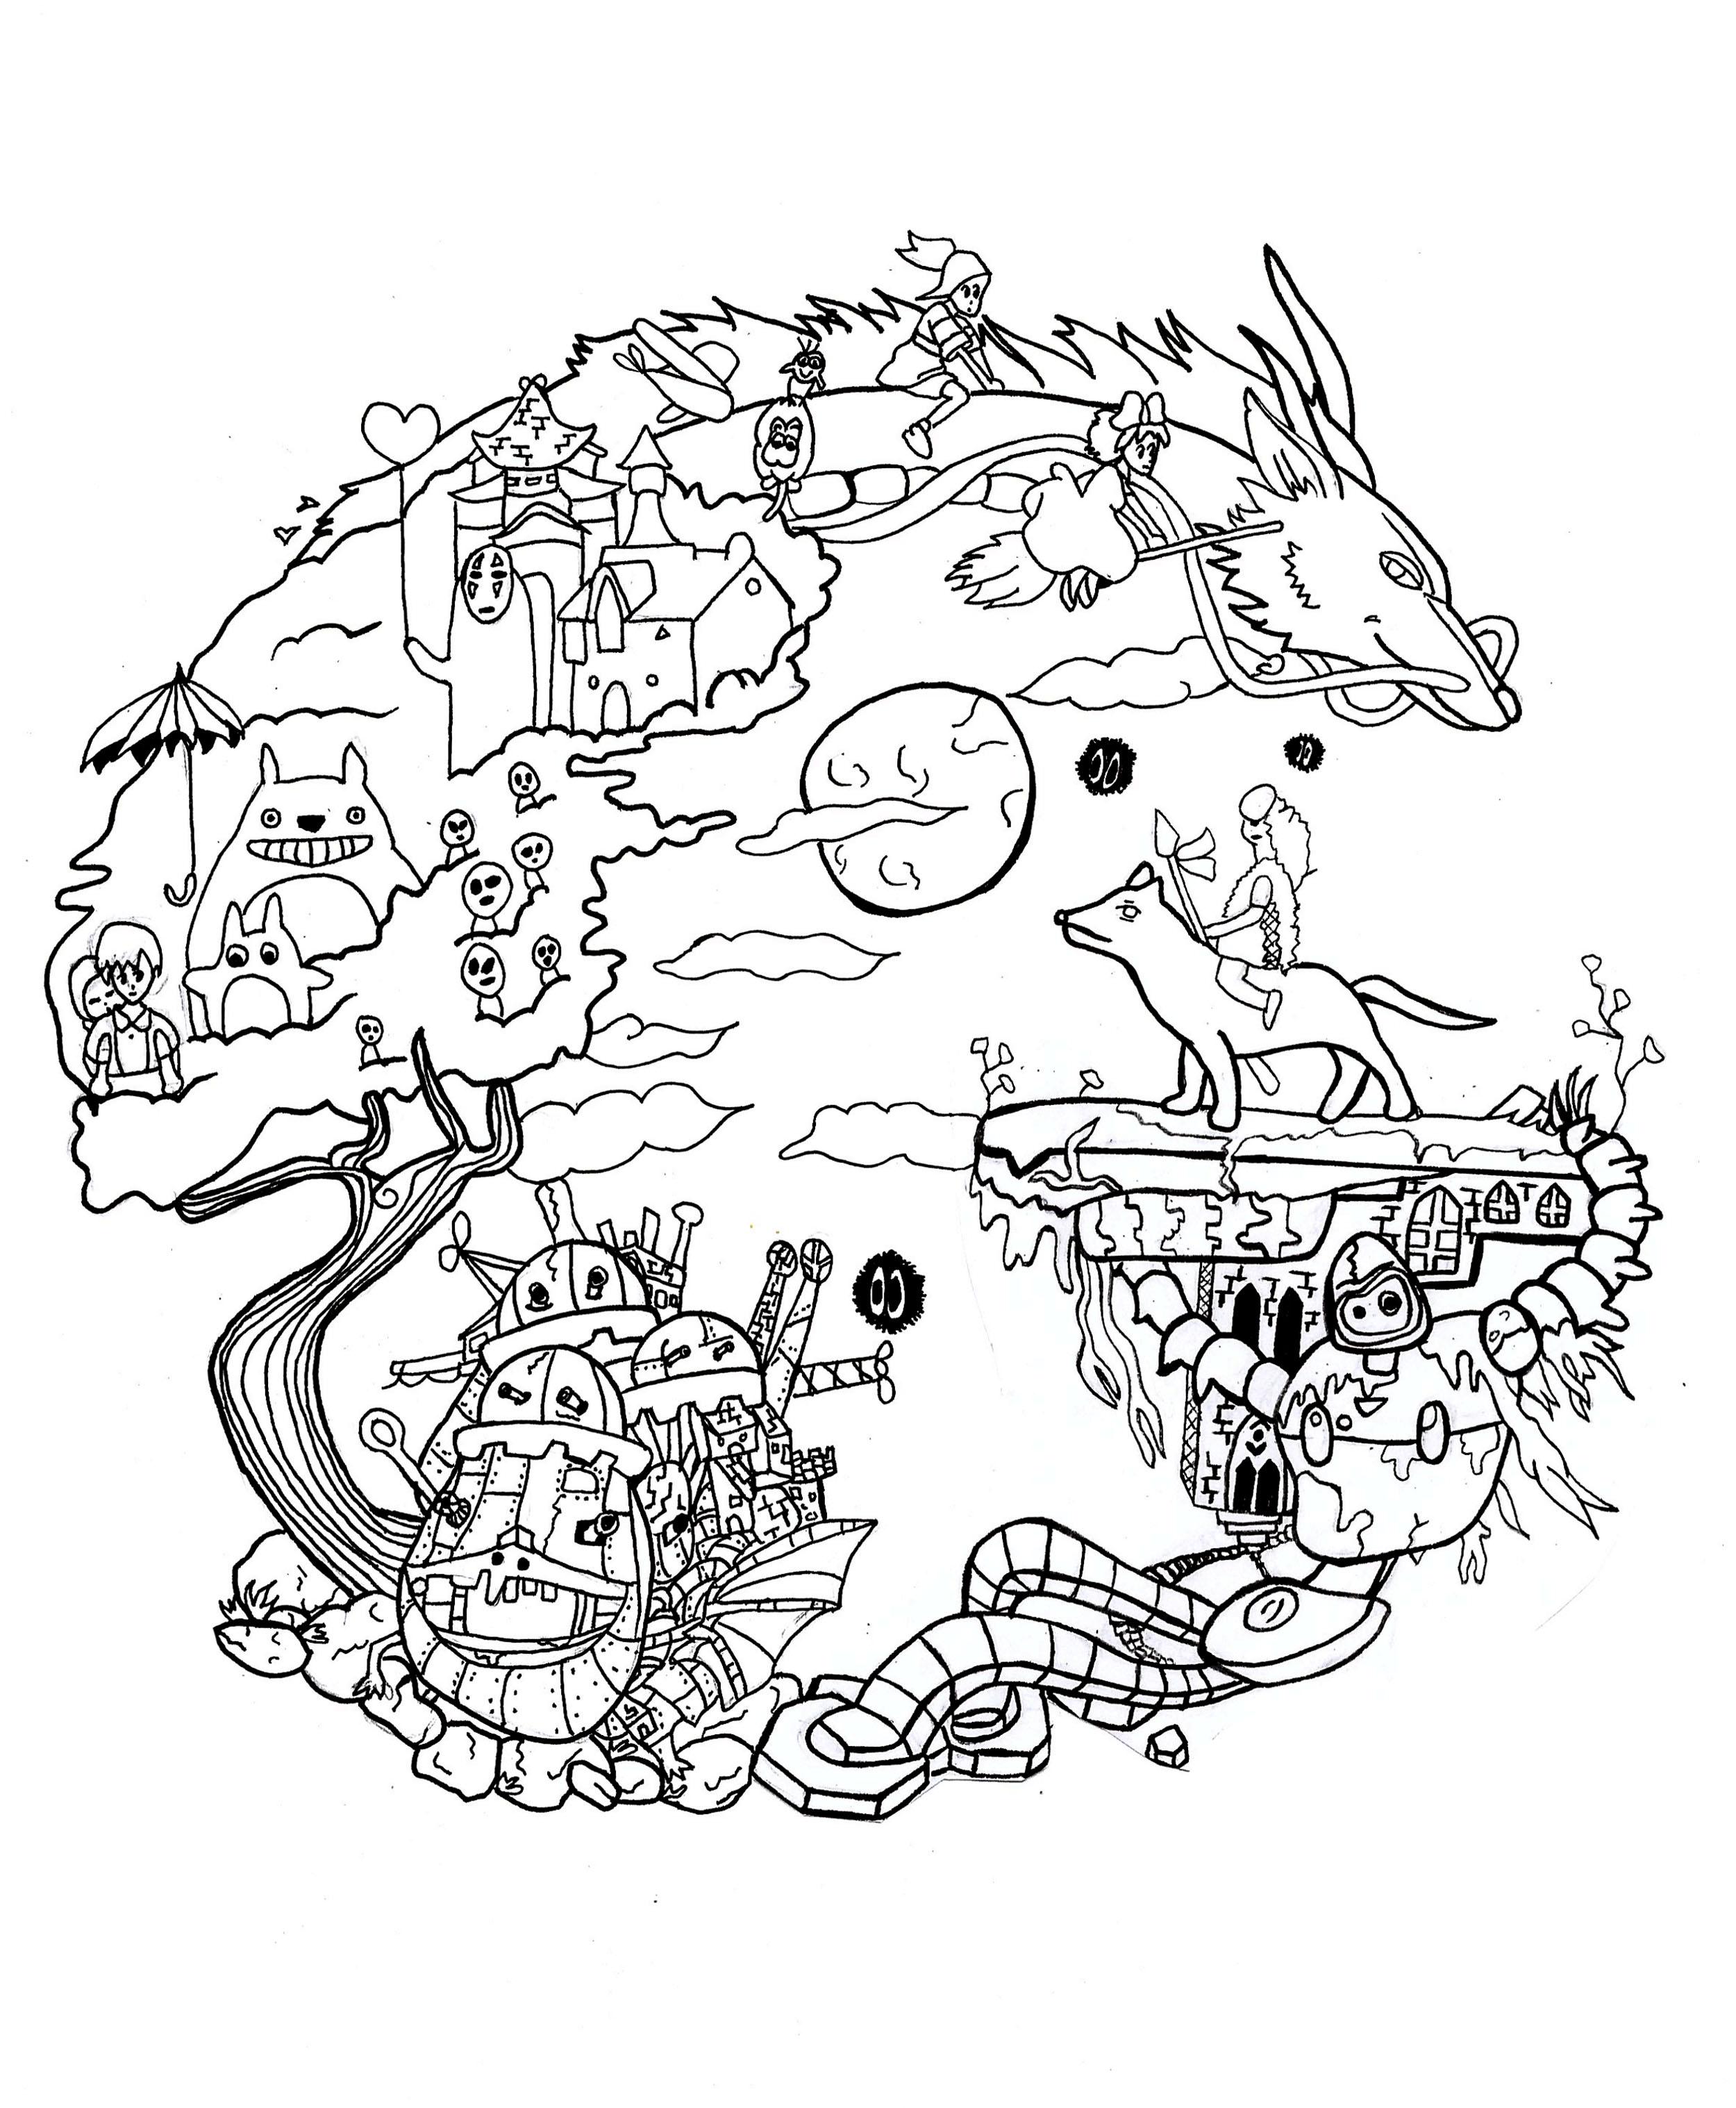 Mandala a imprimer studio ghibli mandalas de difficult for Kiki s delivery service coloring pages